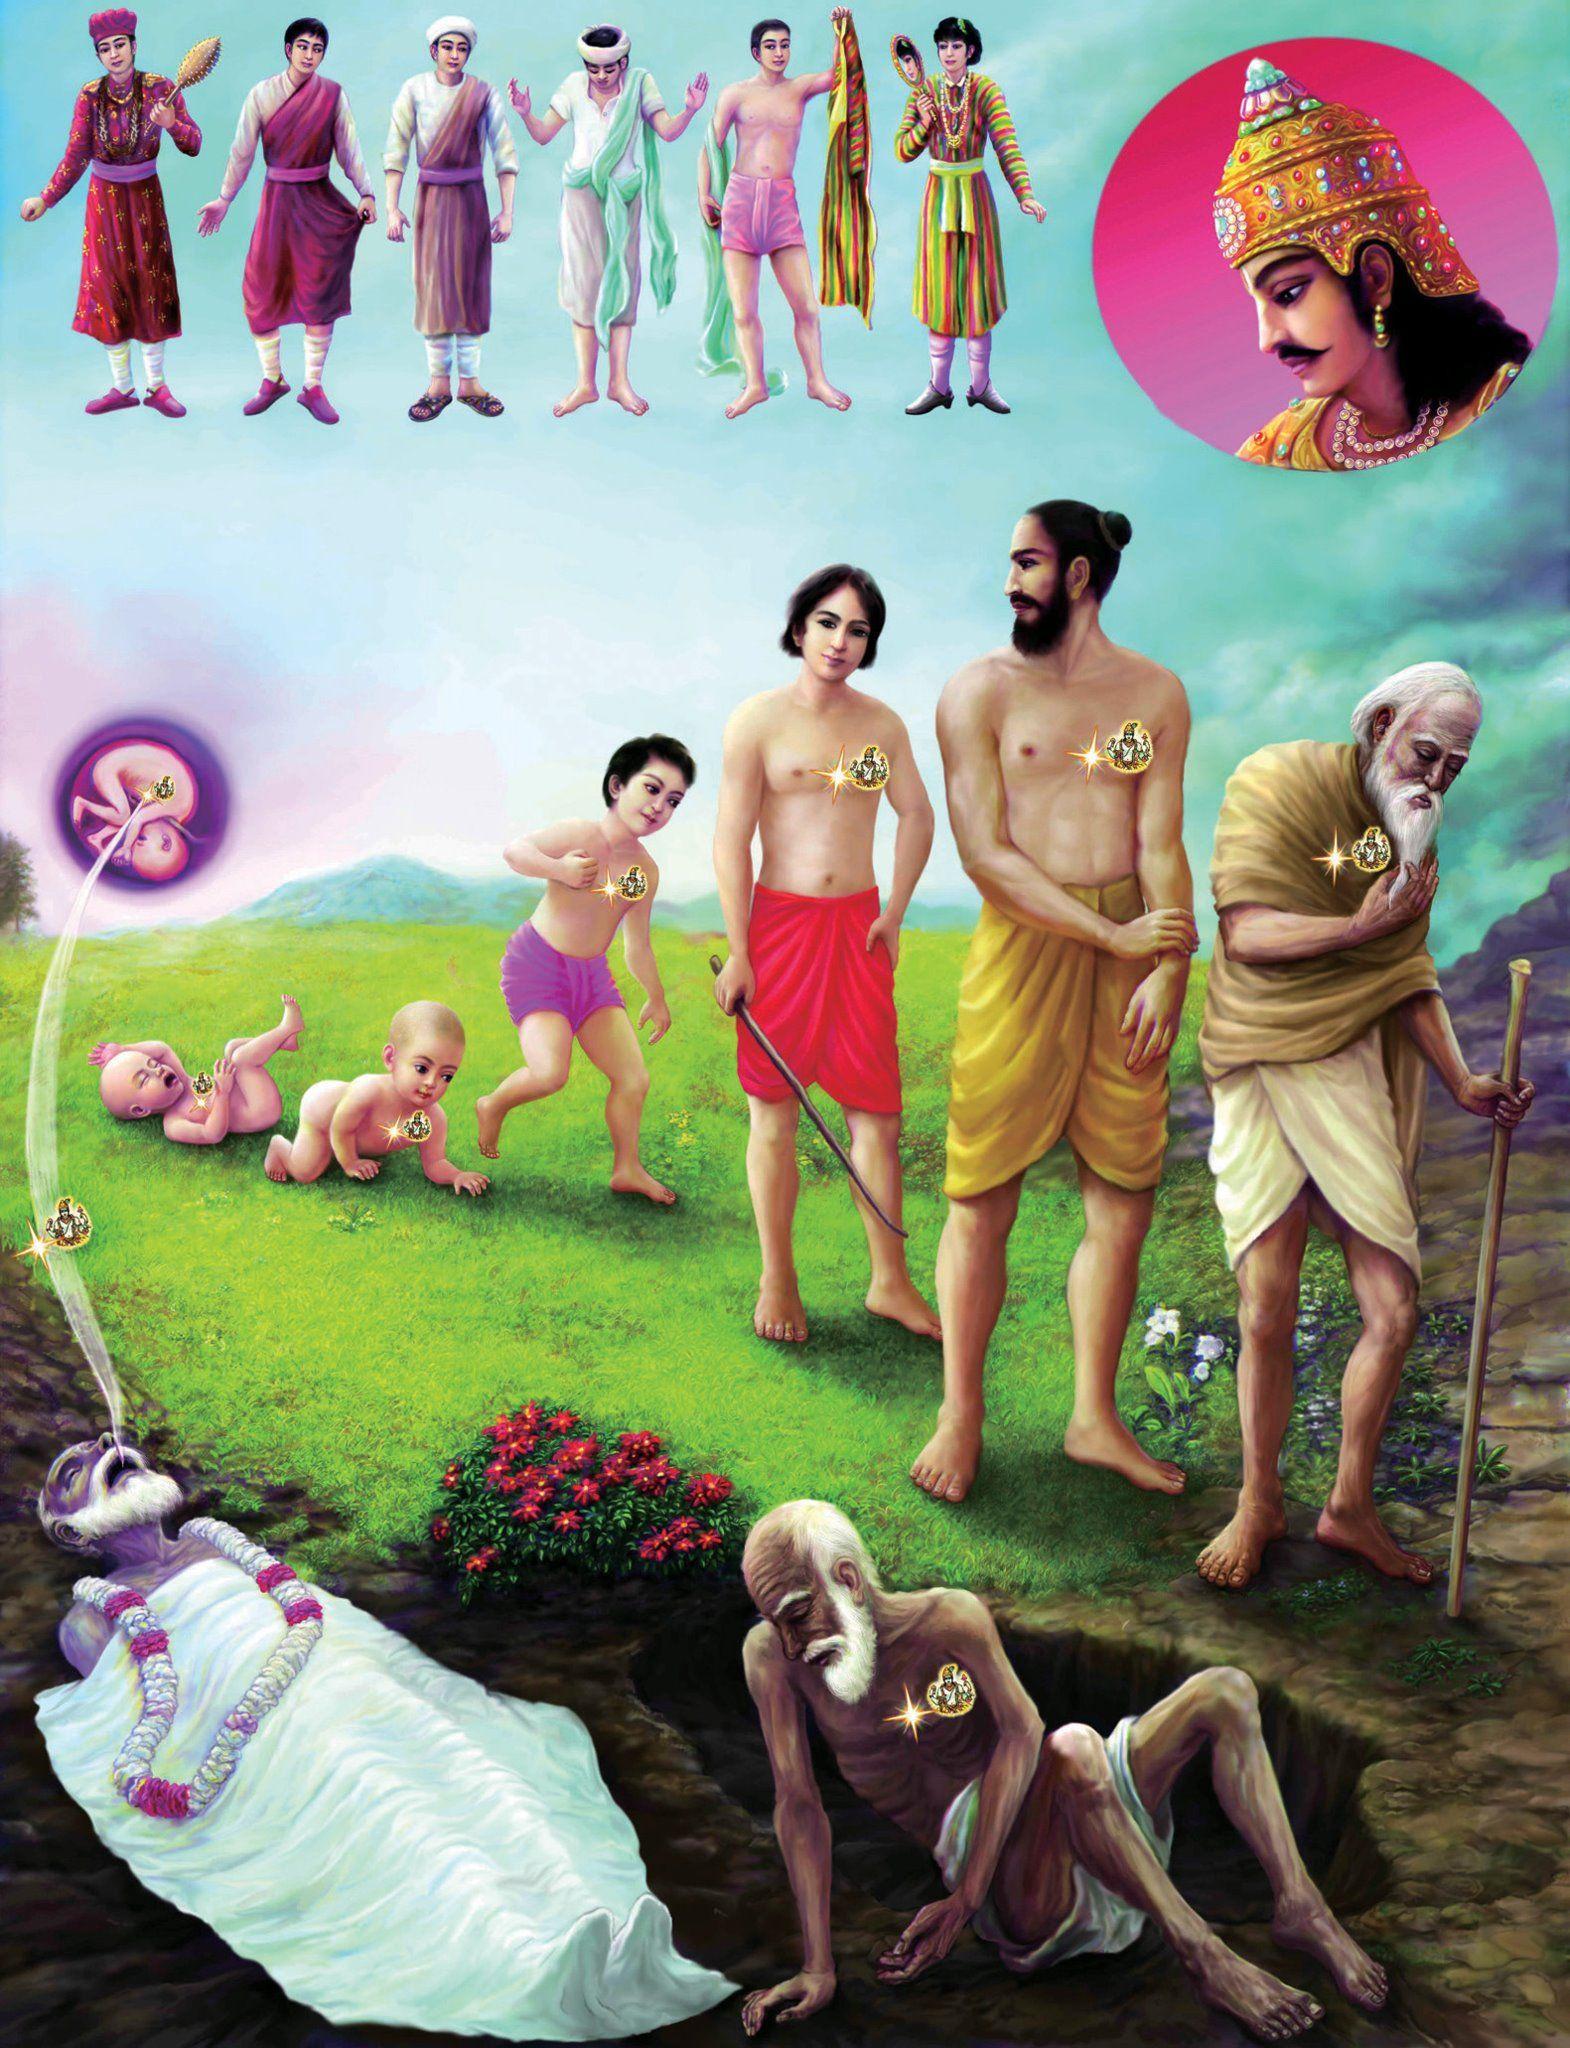 reincarnation - Google Search | Reincarnation, Bhagavad gita ...